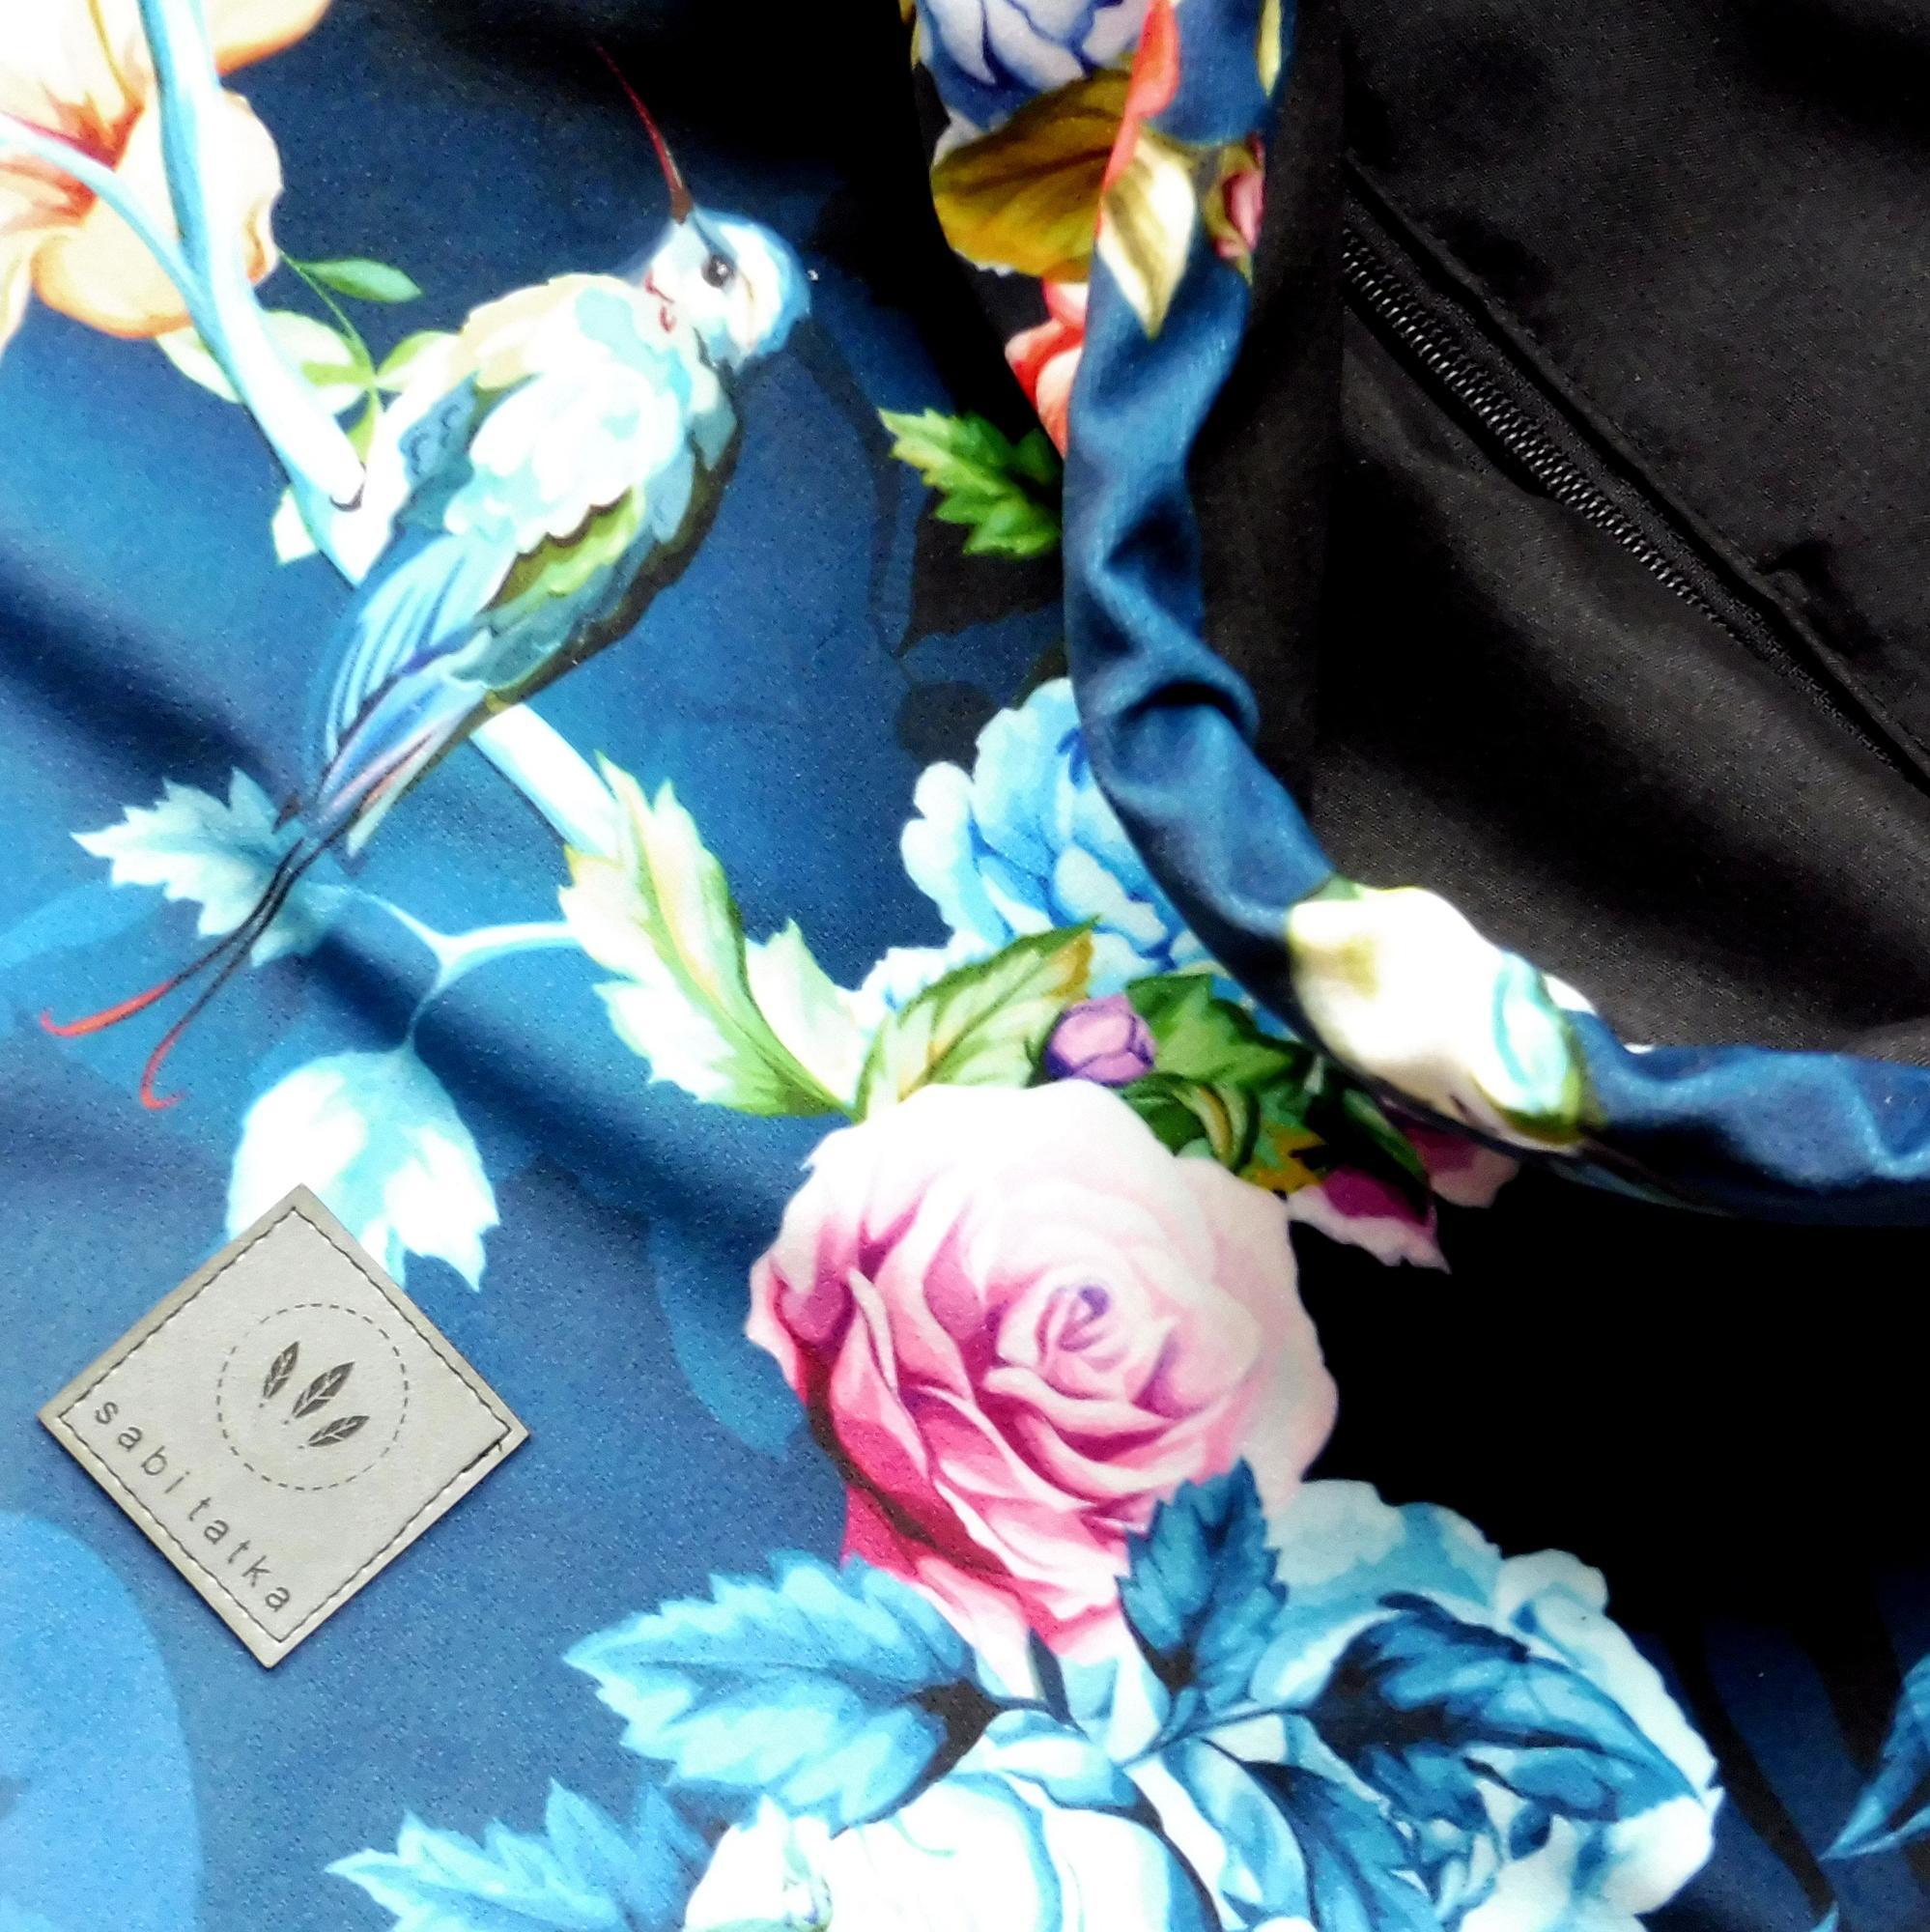 Plecak welurowy Kolibry Róże - miękki plecak worek z weluru - Sabi Tatka